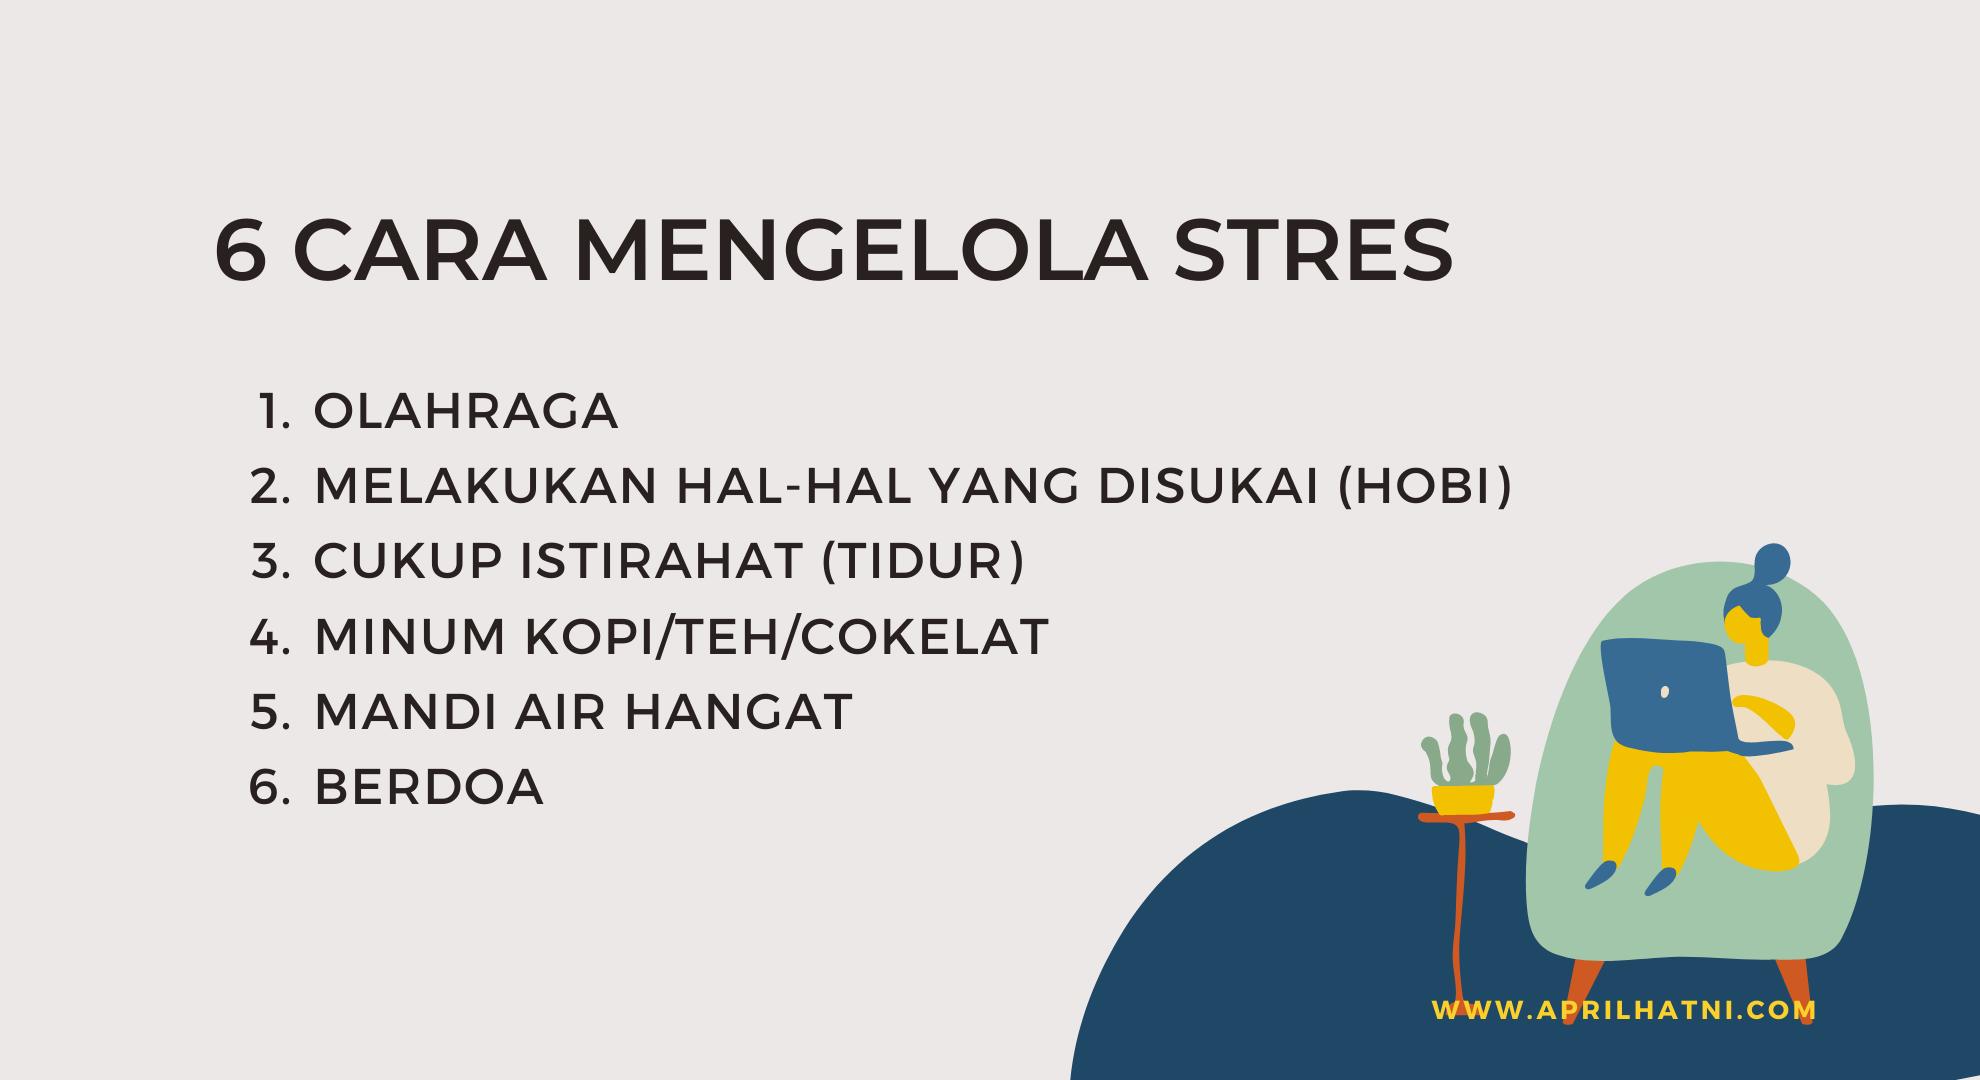 6 cara mengelola stres